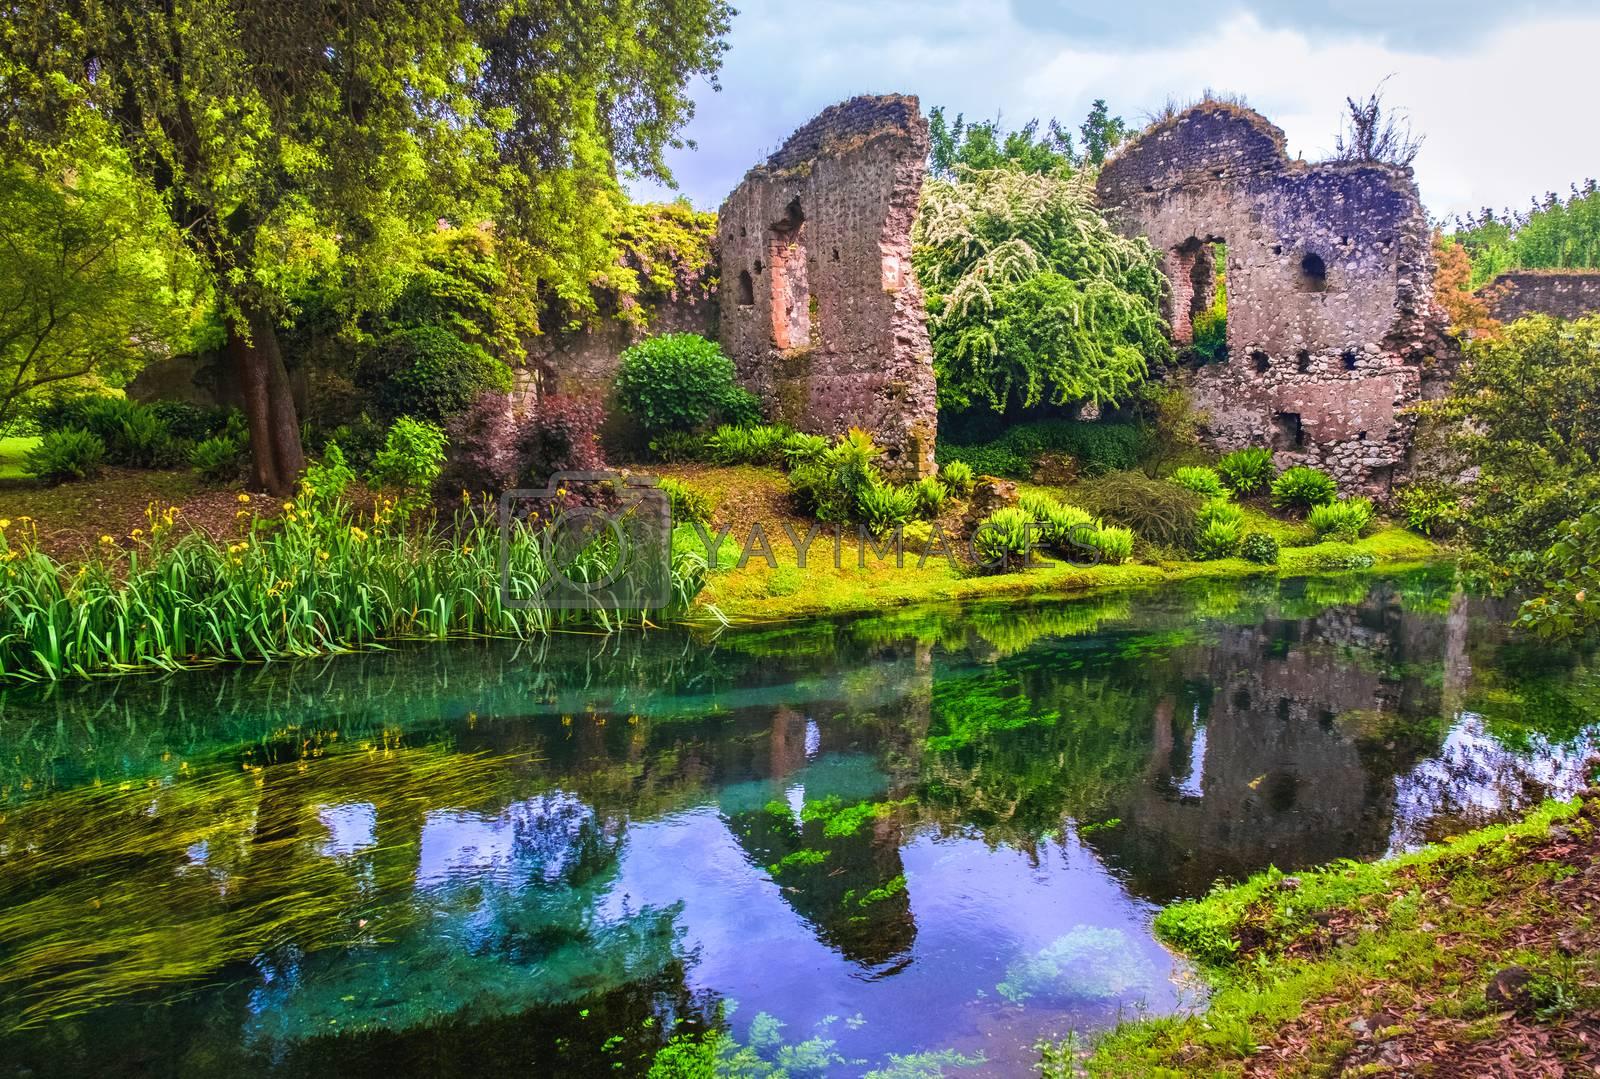 dream river enchanted castle ruins garden fairy tale nymph garden by Luca Lorenzelli